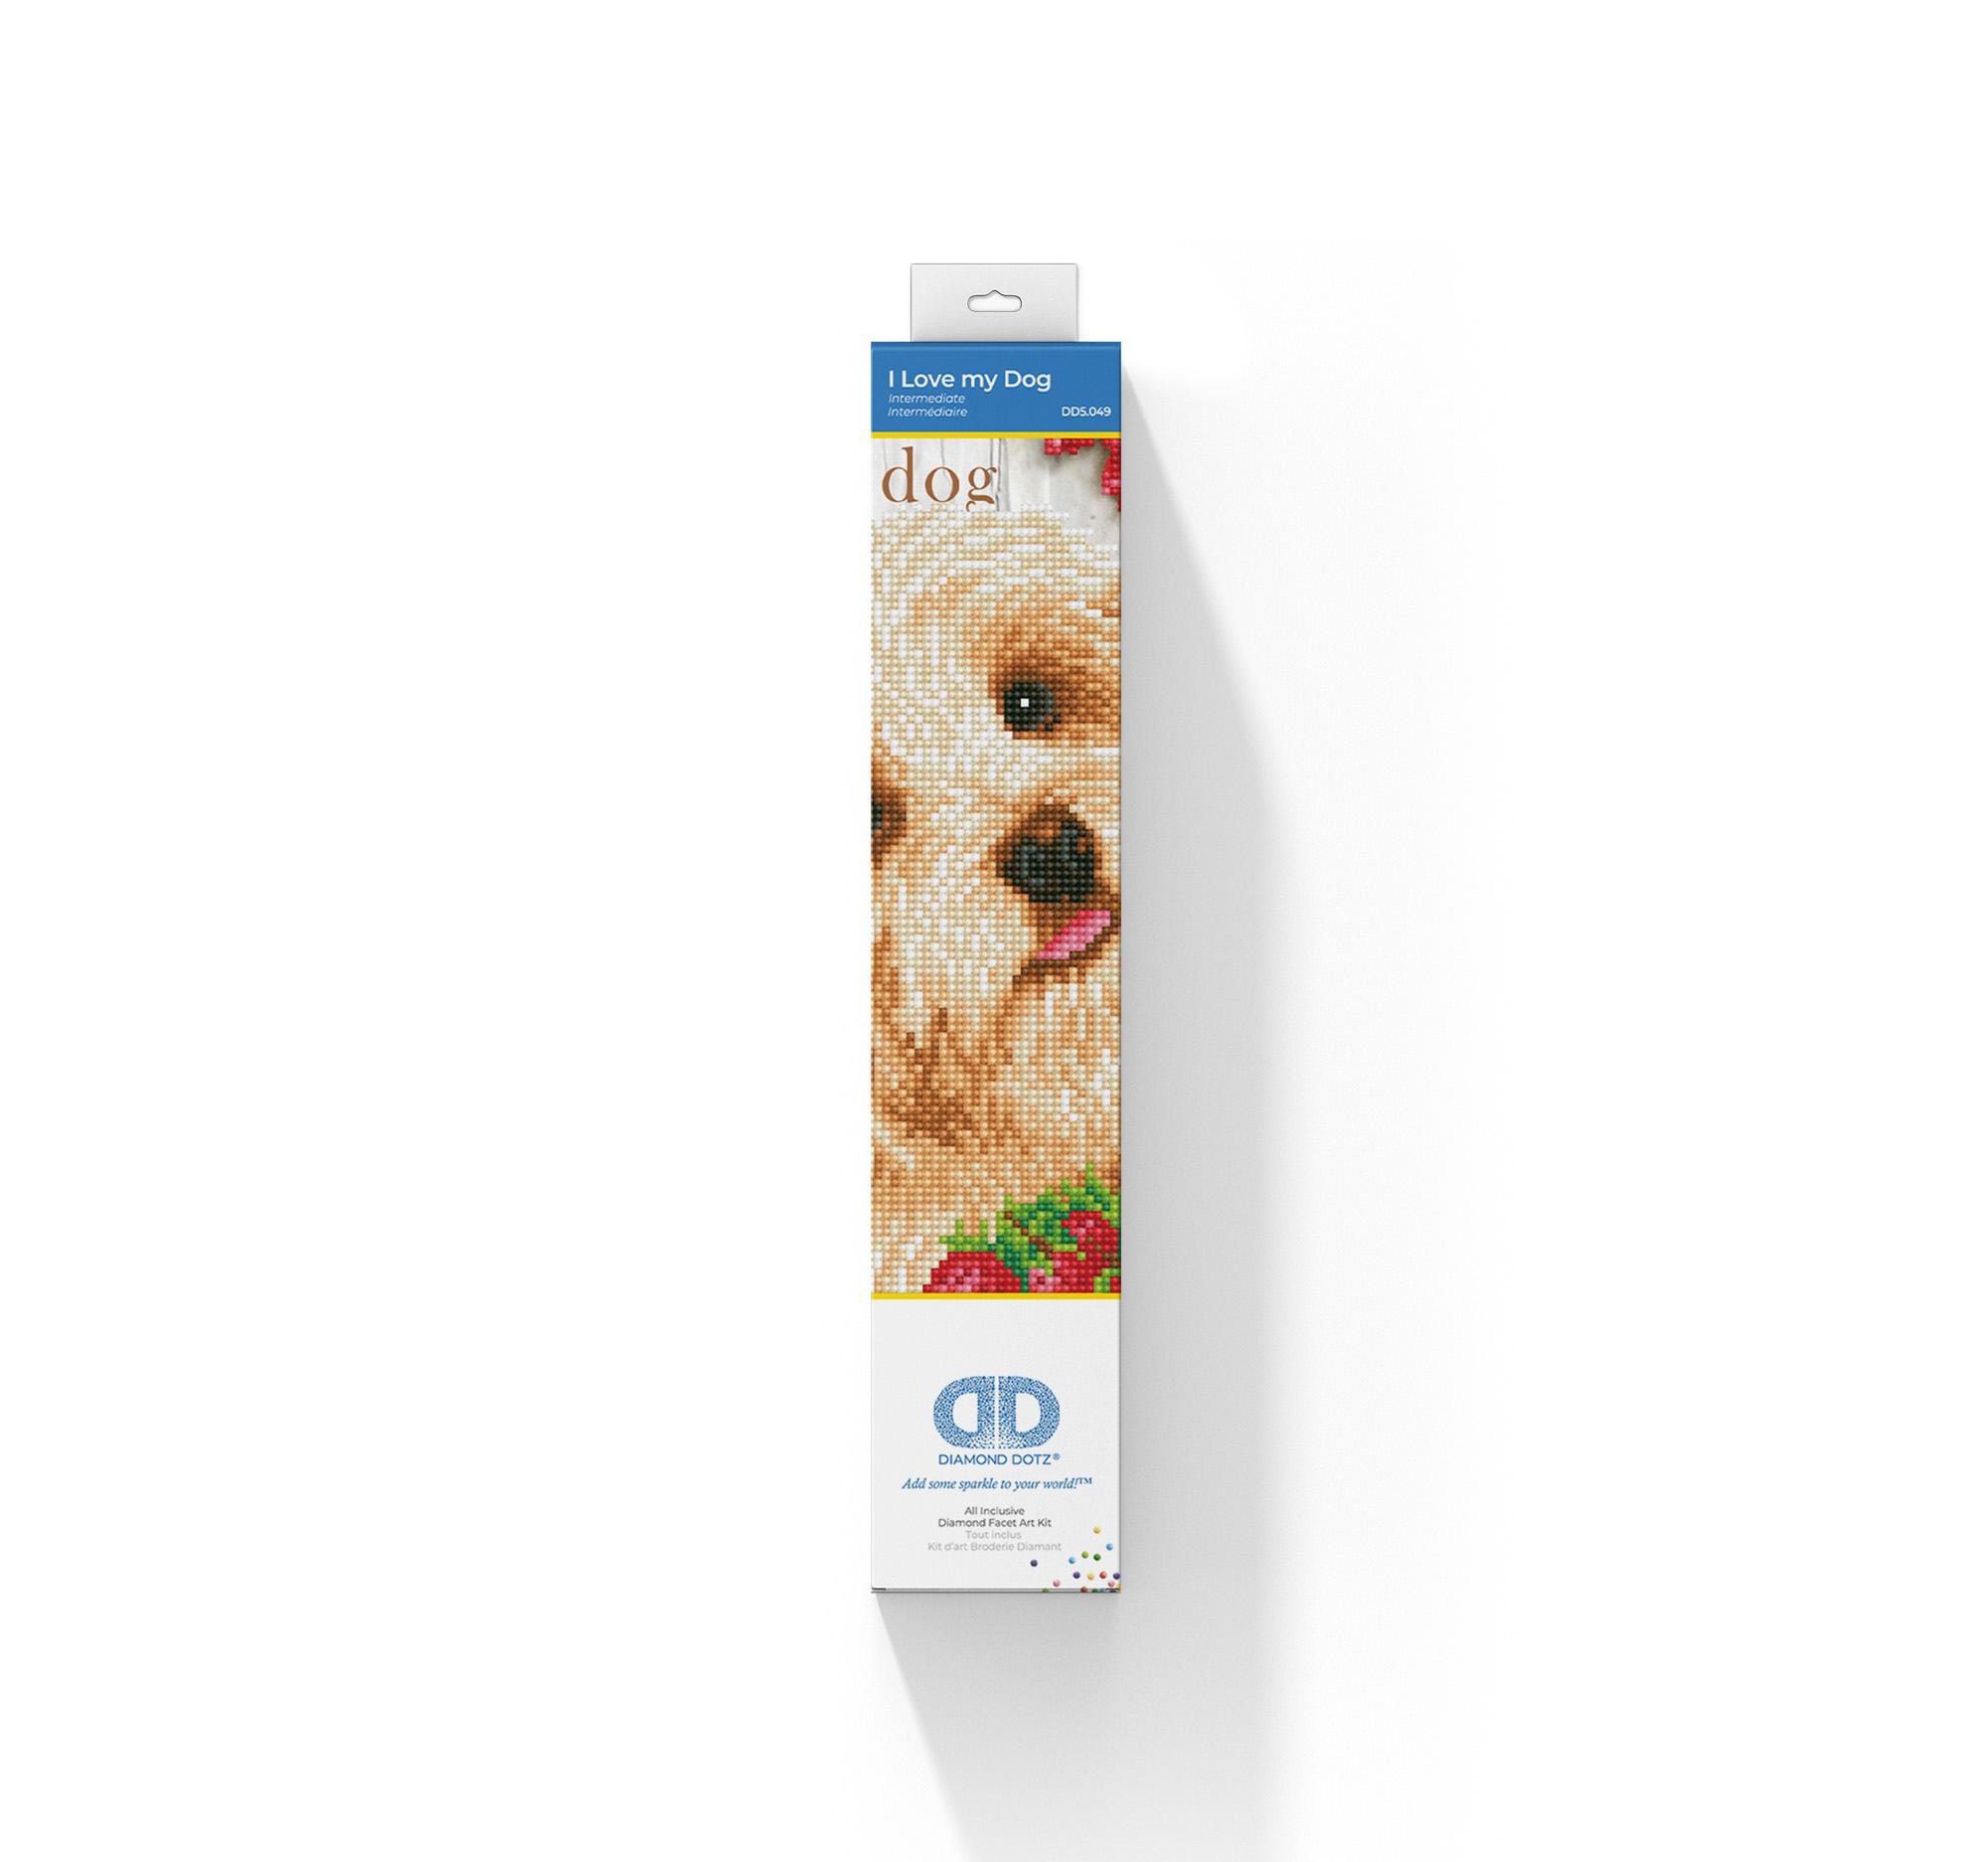 DD5.049_packaging (1)